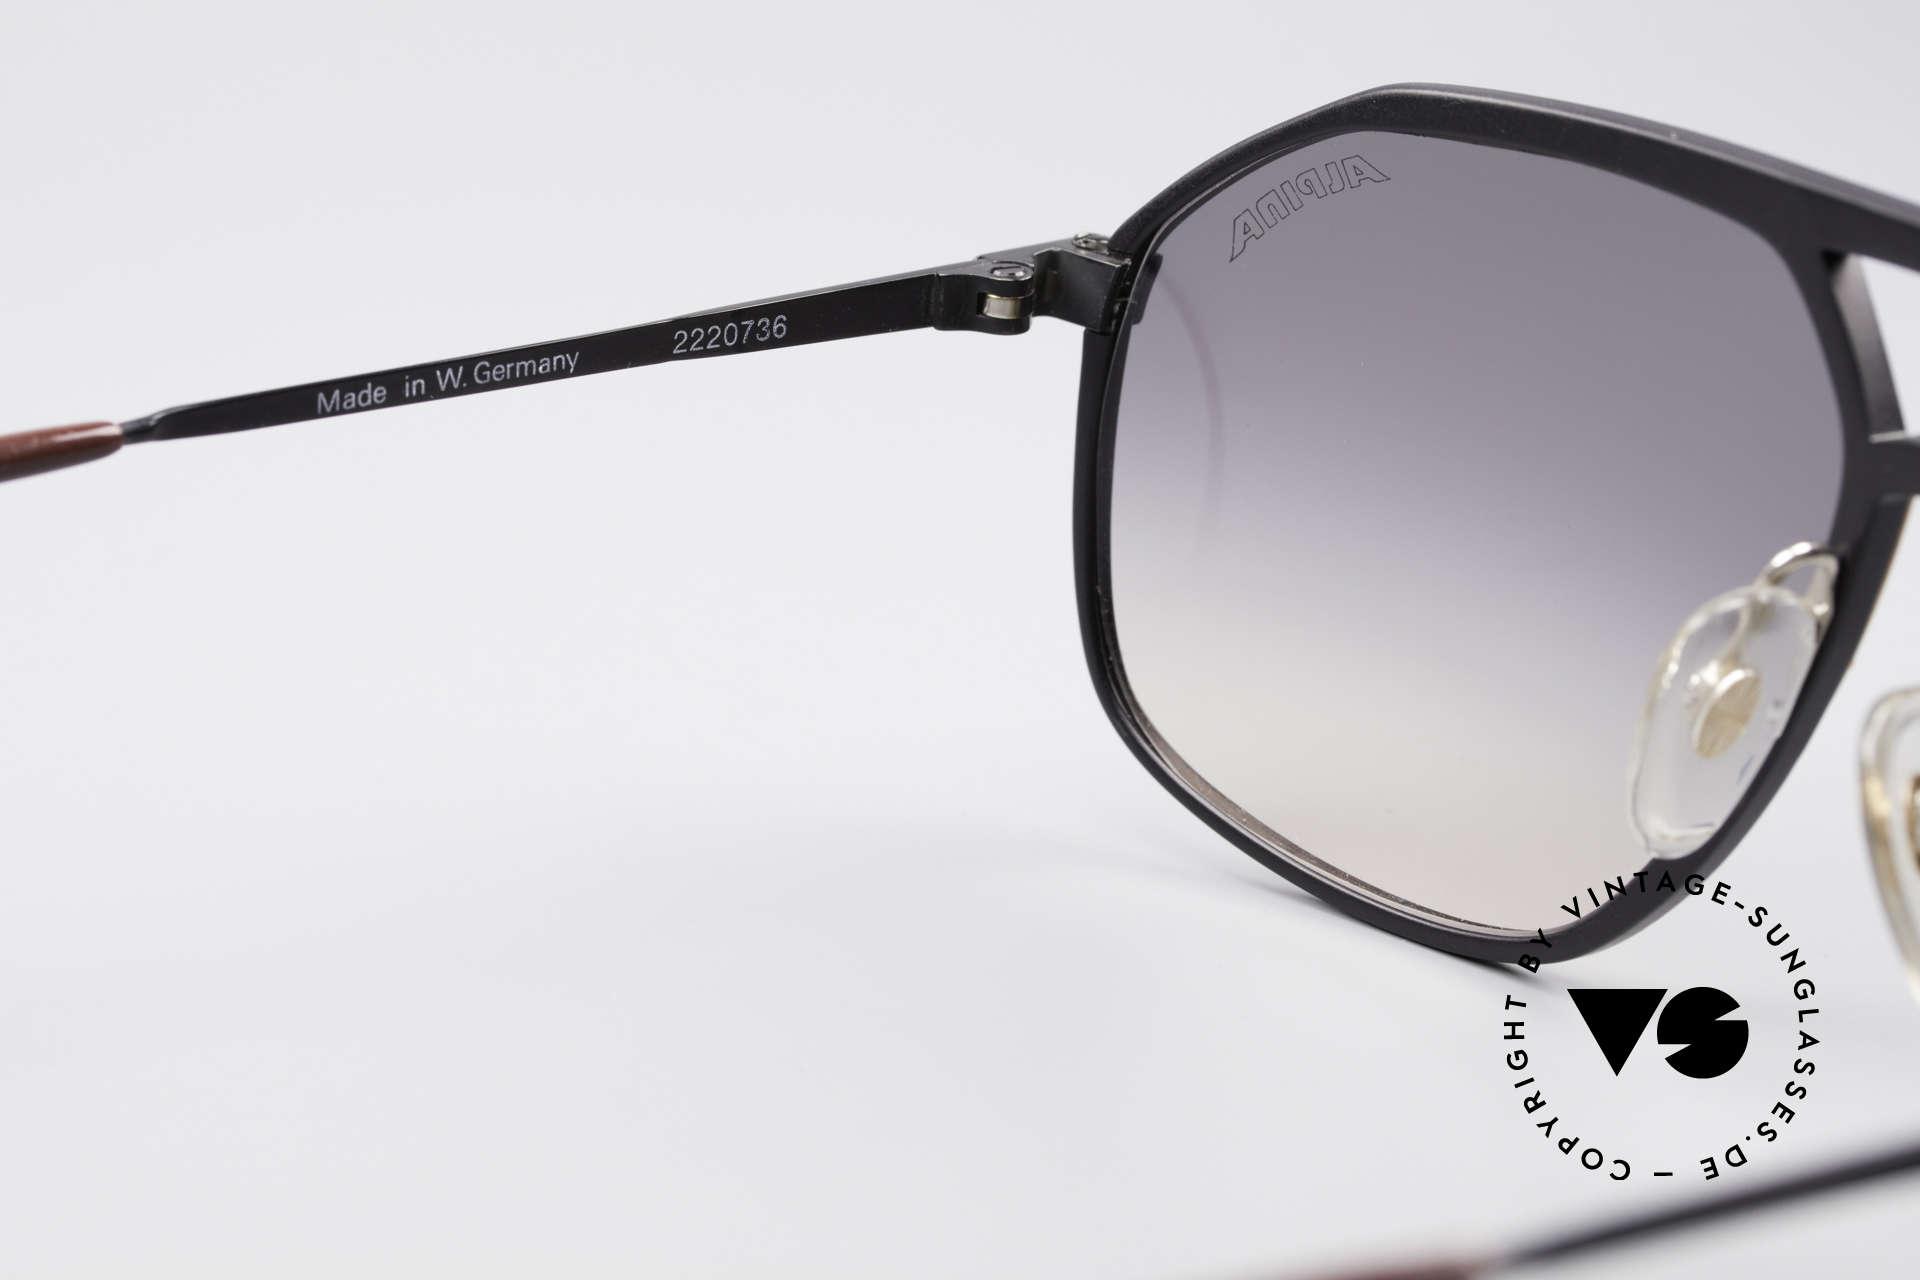 Alpina M1/7 Iconic Vintage Sunglasses, never worn, NOS (like all our rare Alpina sunglasses), Made for Men